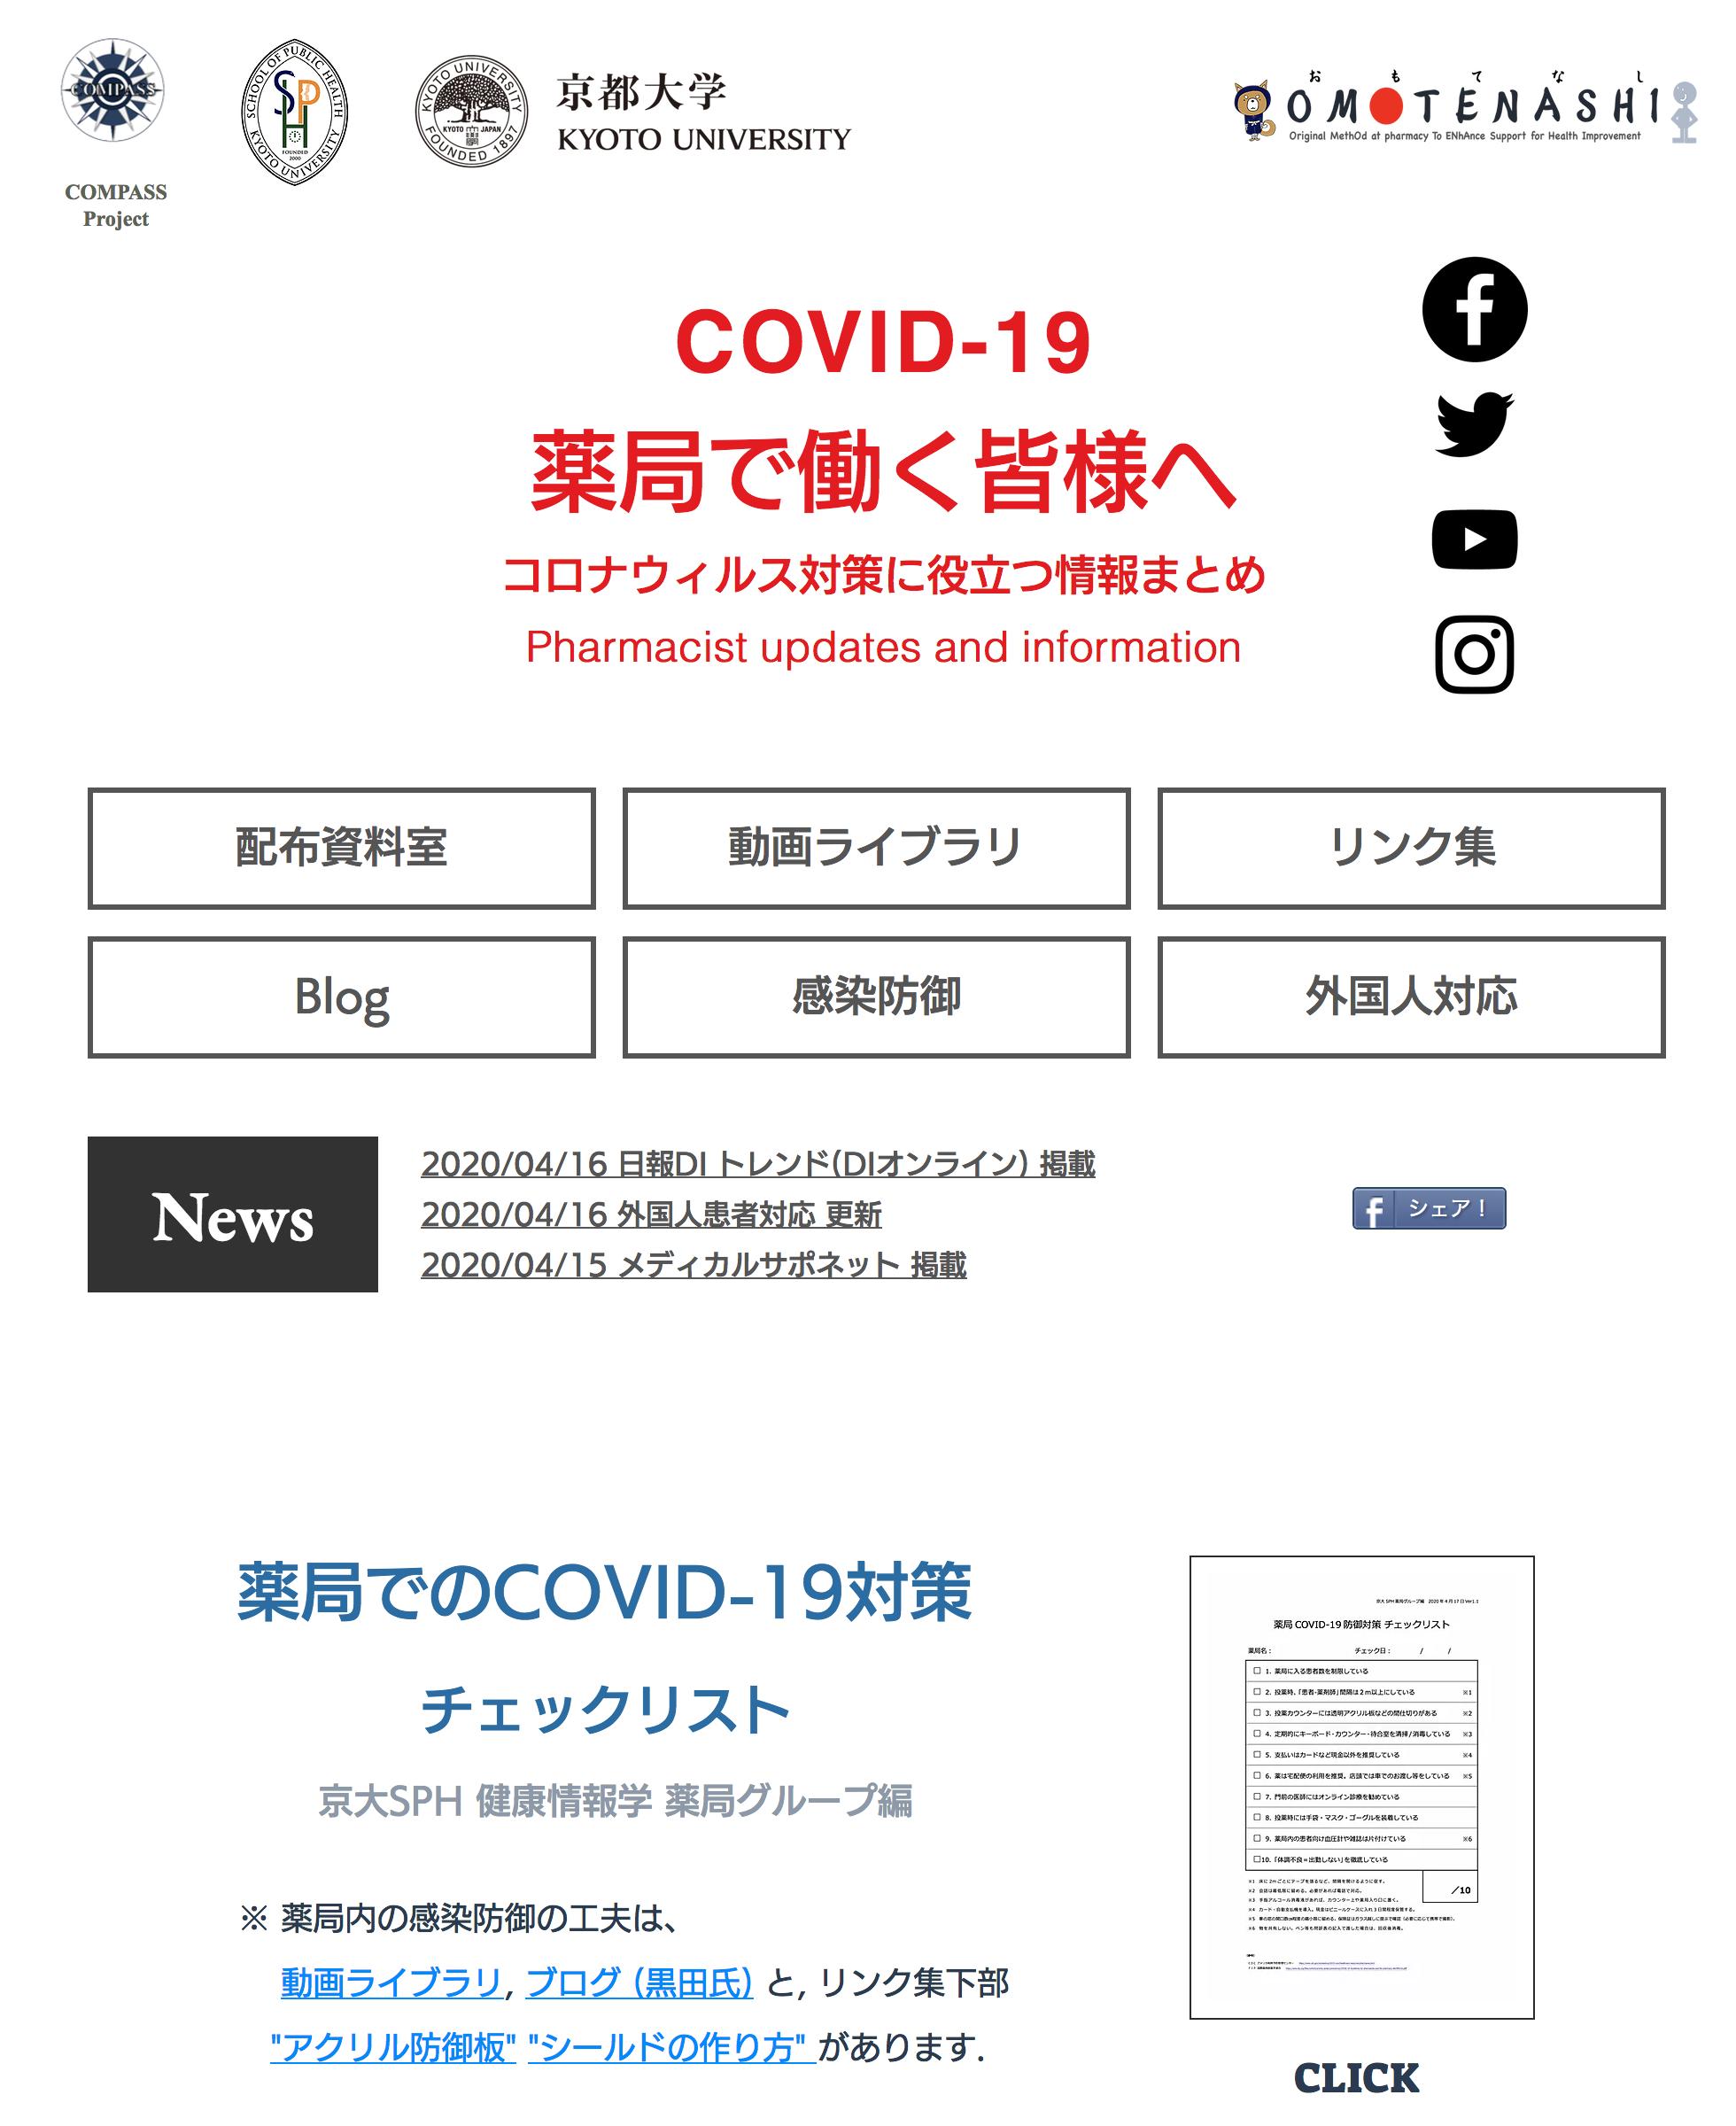 COVID-19対策情報ウェブサイト